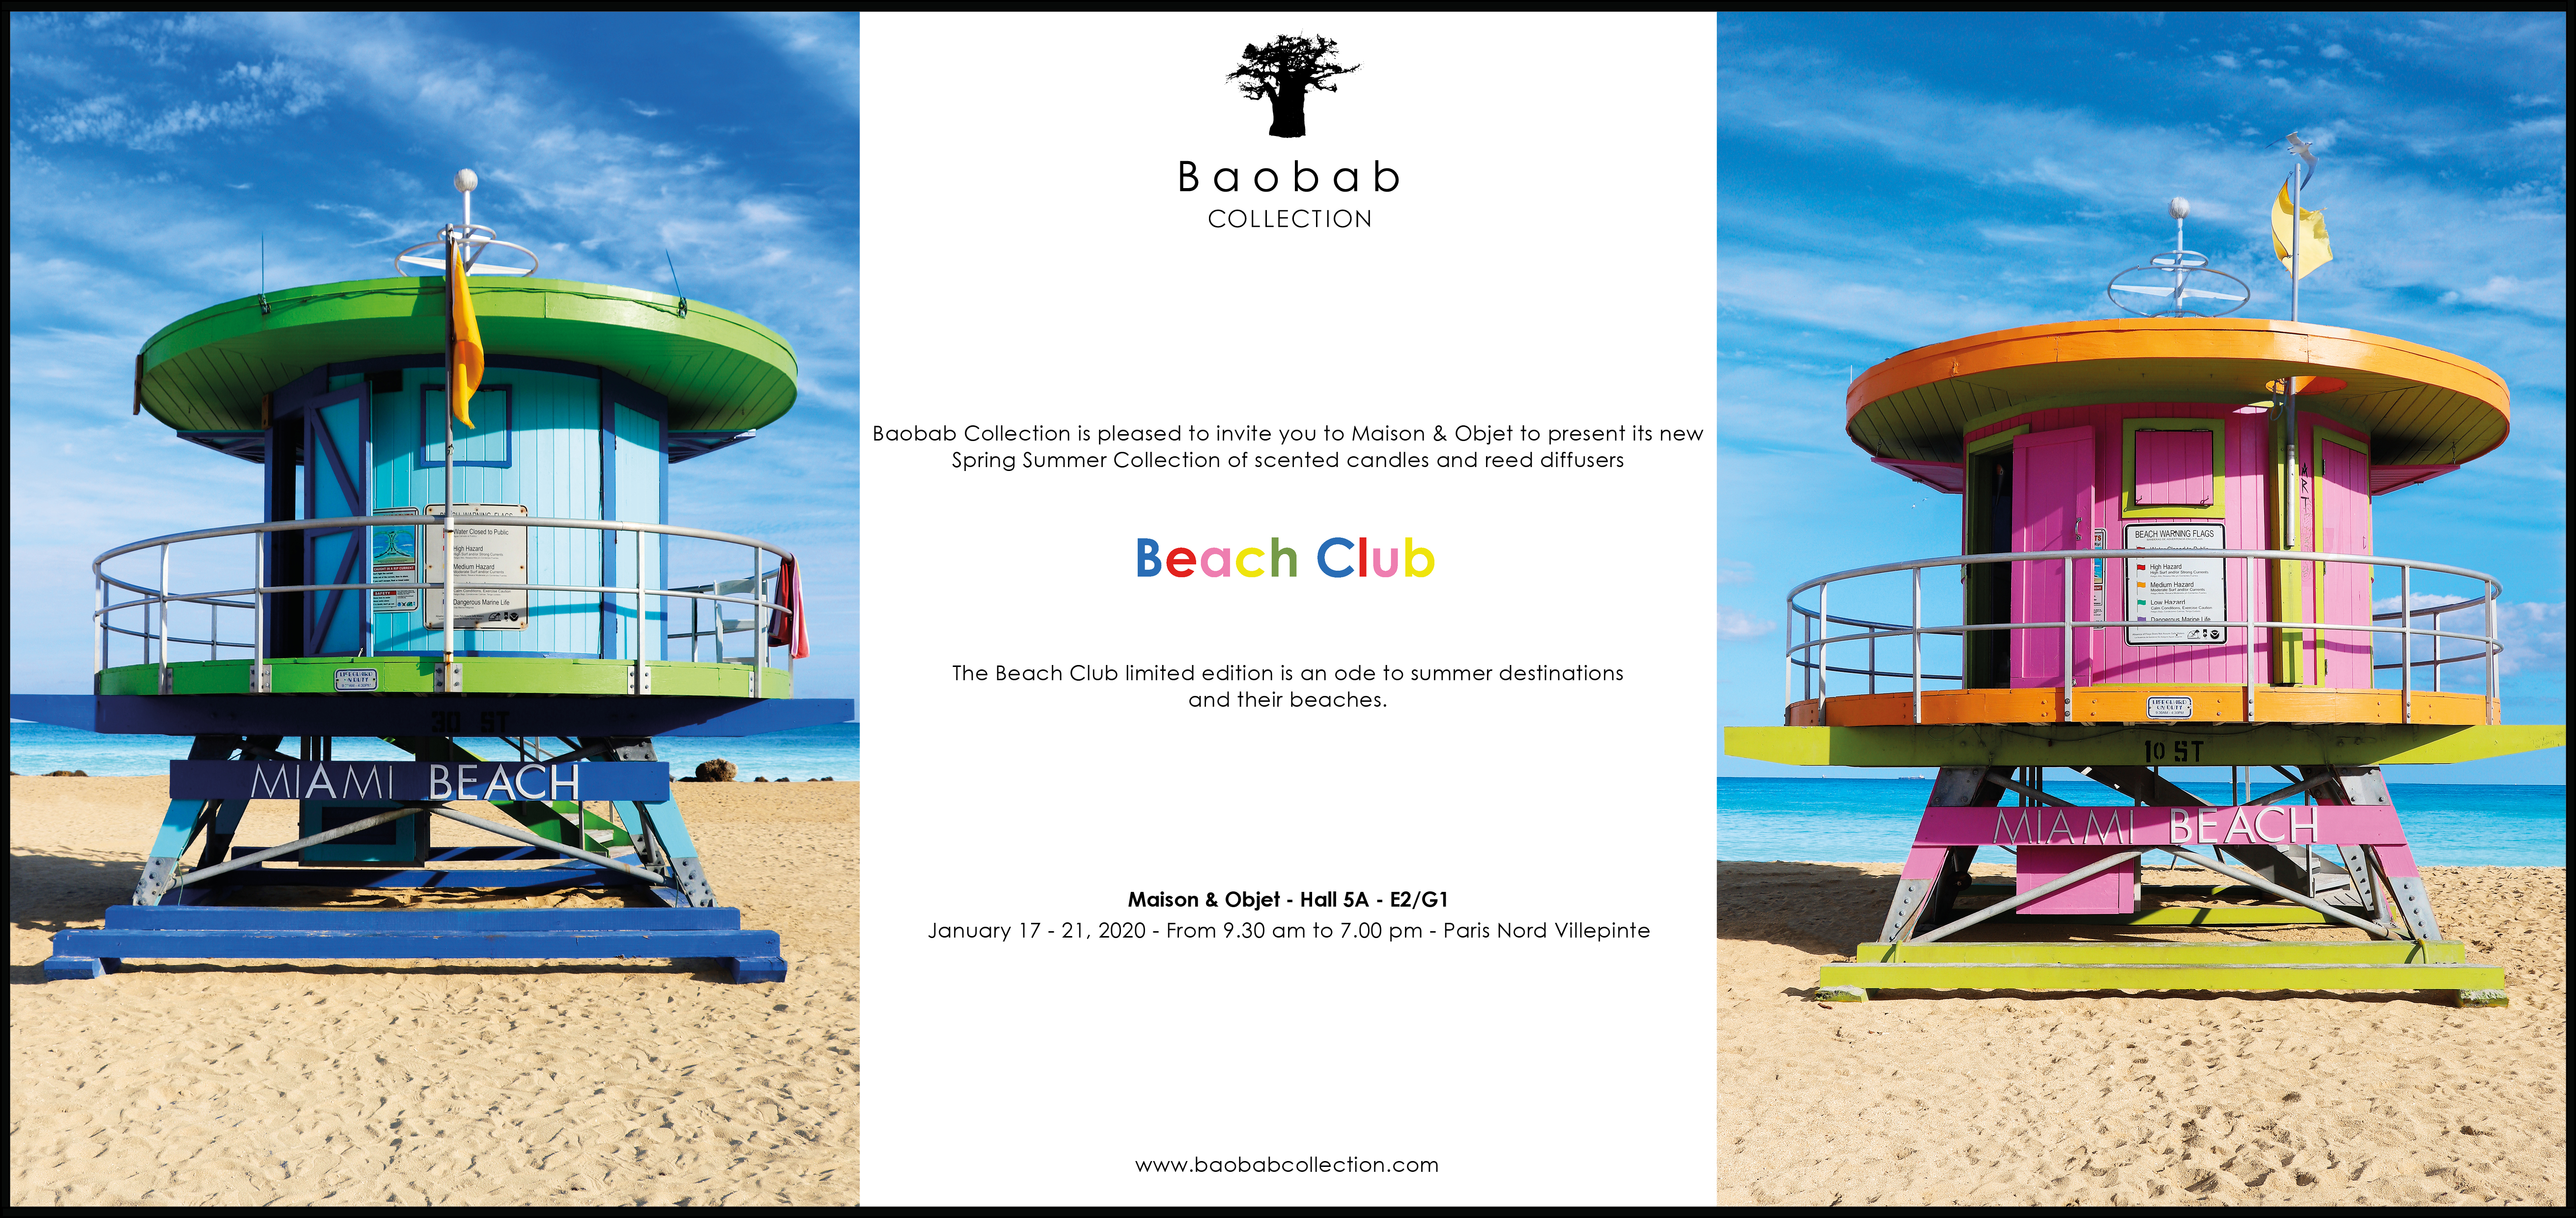 M&O_INVITATION_BEACH_CLUB_SUMMER_2020